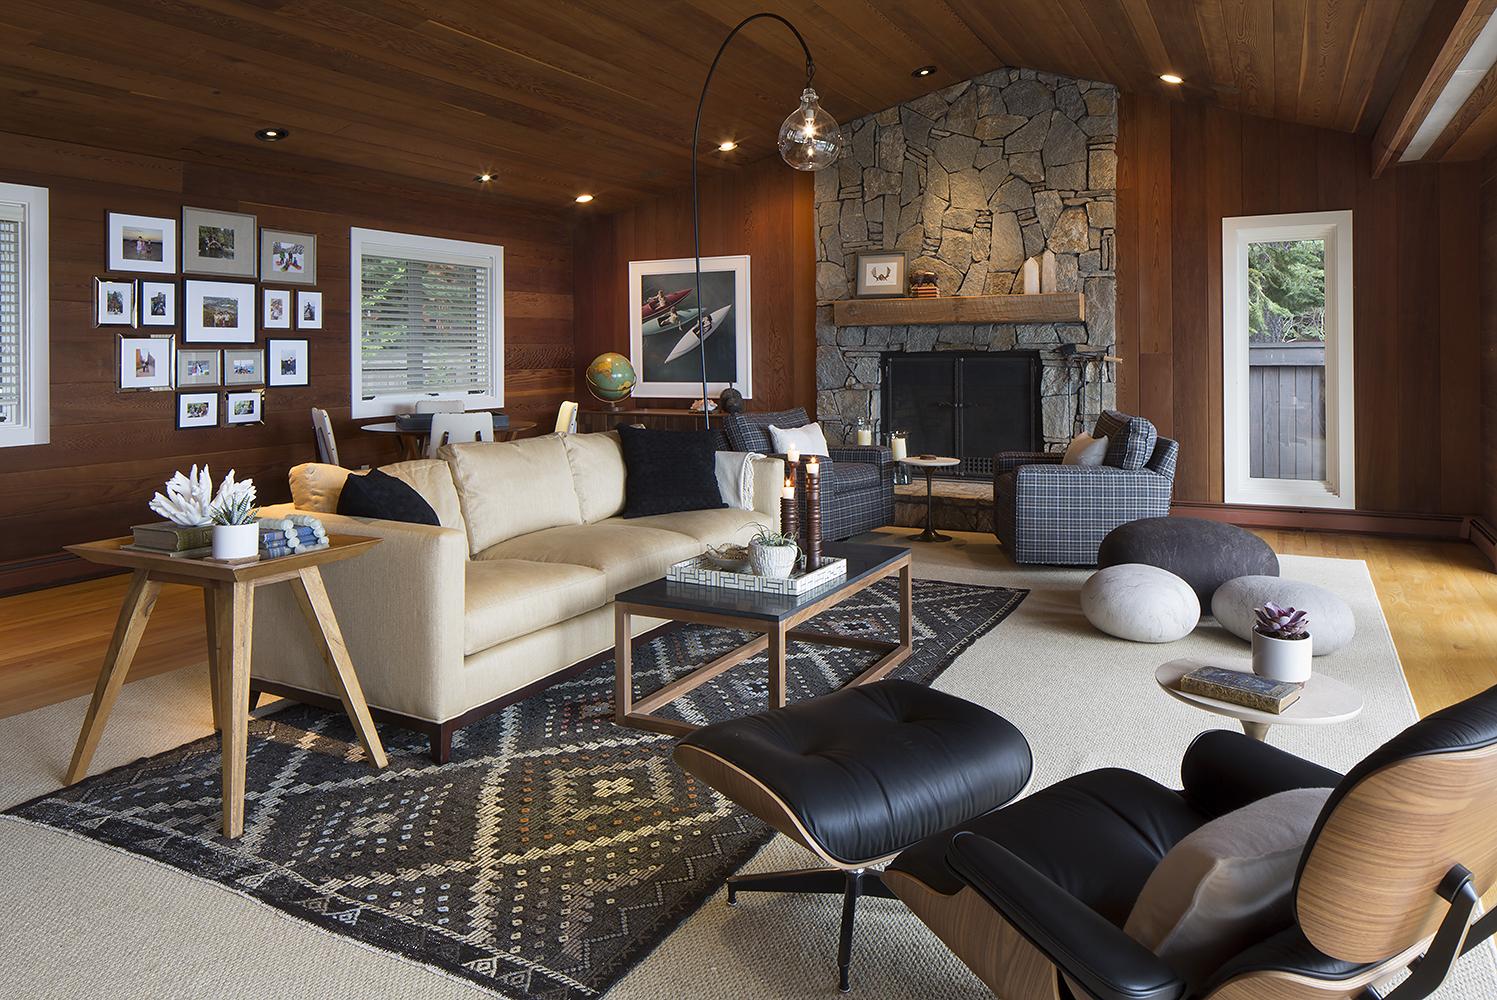 piedmont post archives | laura martin bovard interiors